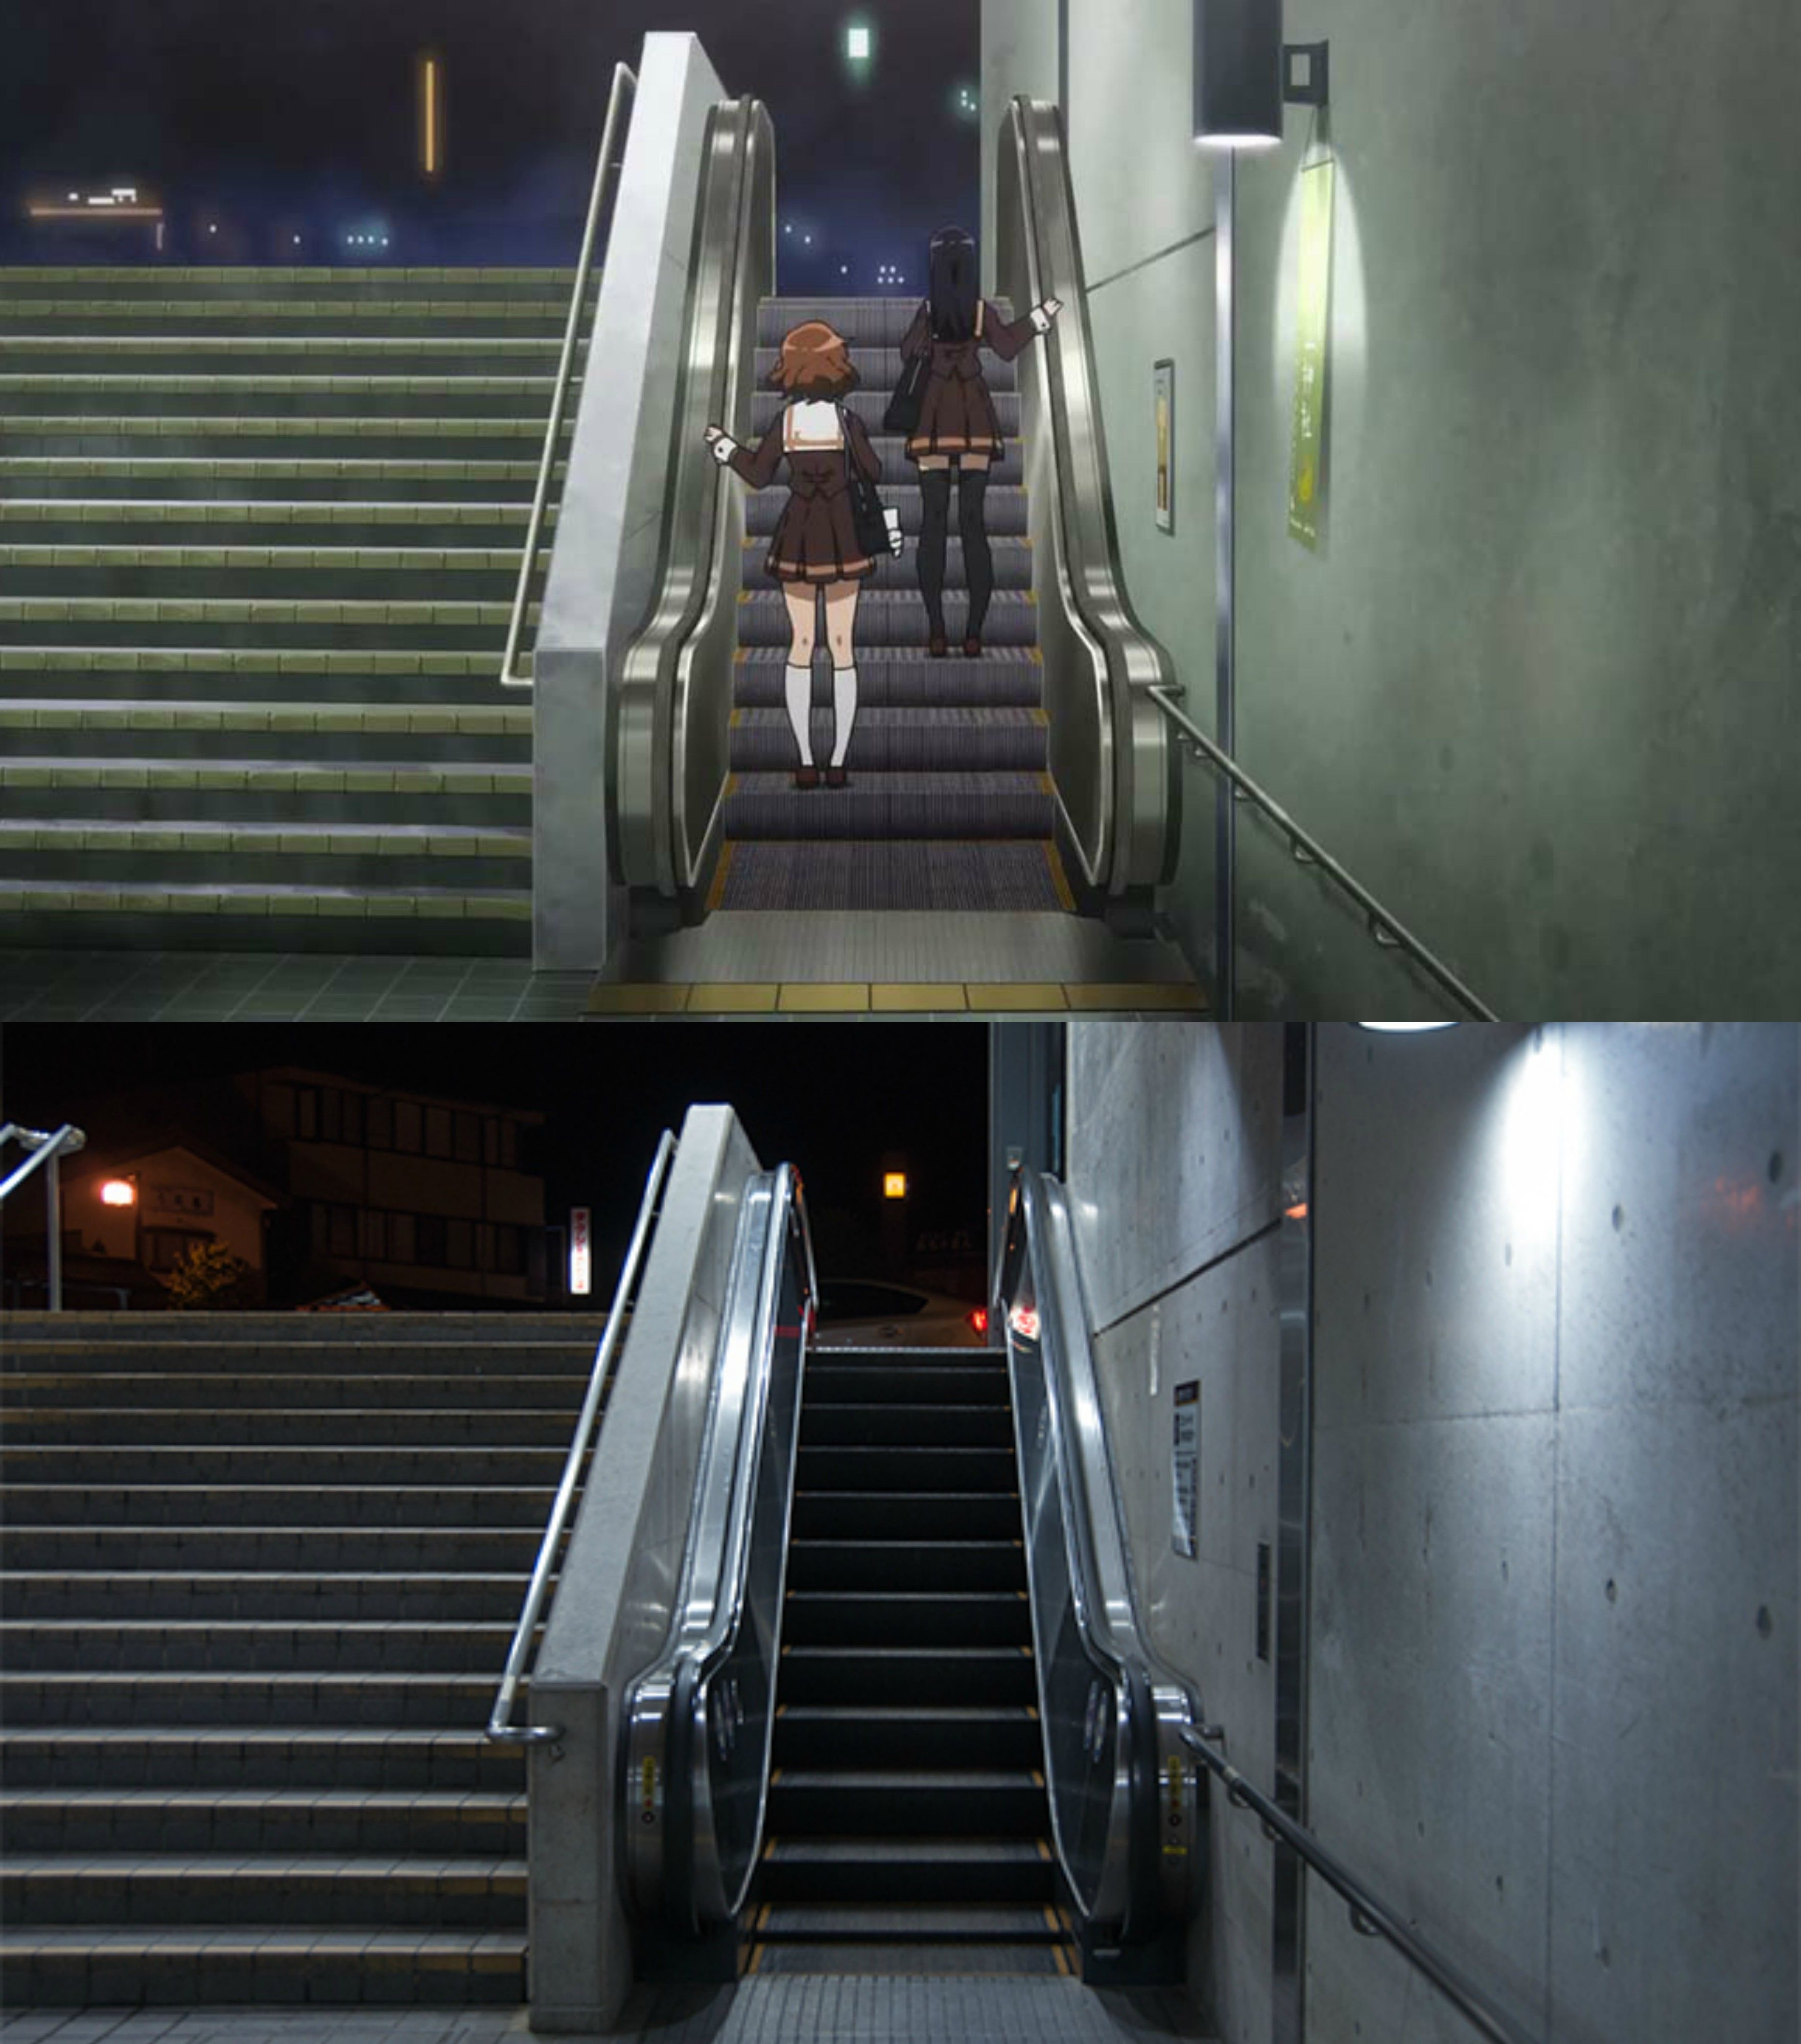 hibike euphonium ユーフォニアム 聖地巡礼 京都アニメーション